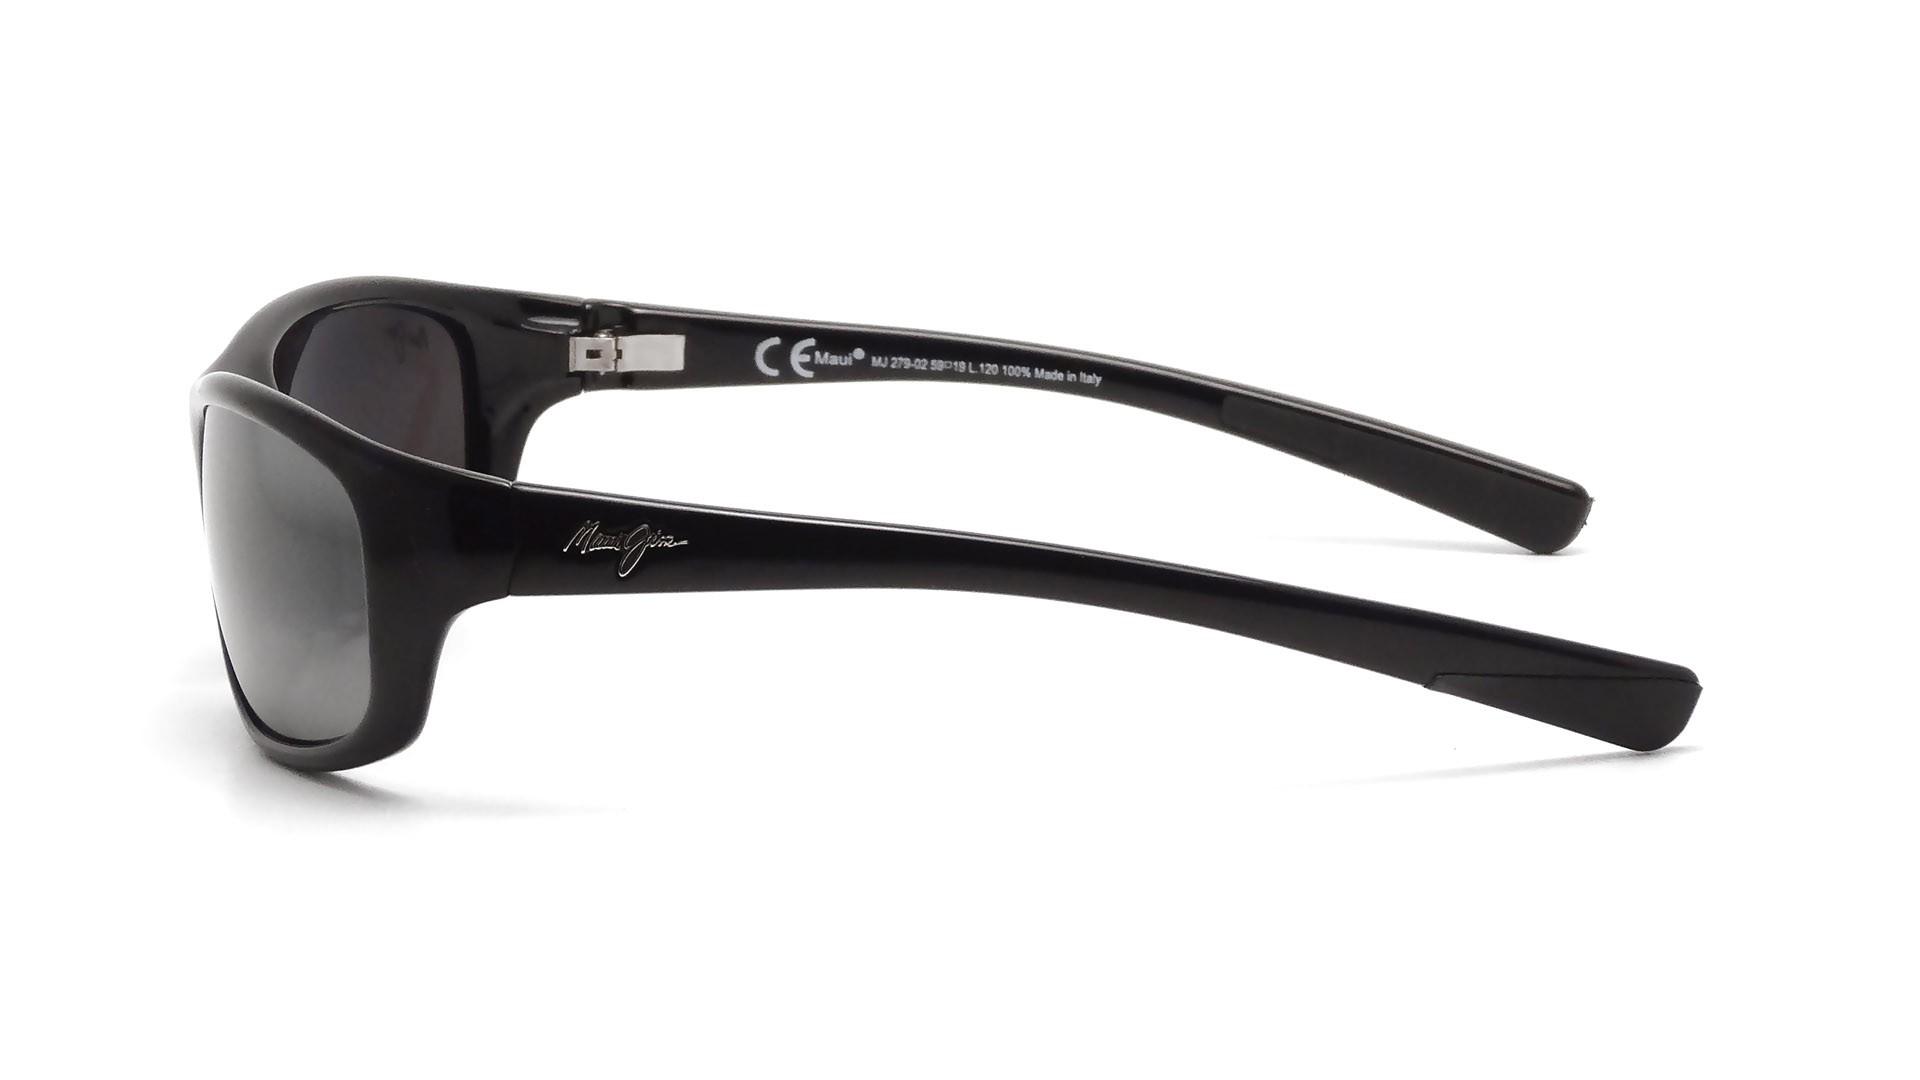 3ef28f82a42f Sunglasses Maui Jim Kipahulu Black 279-02 59-19 Large Polarized Mirror